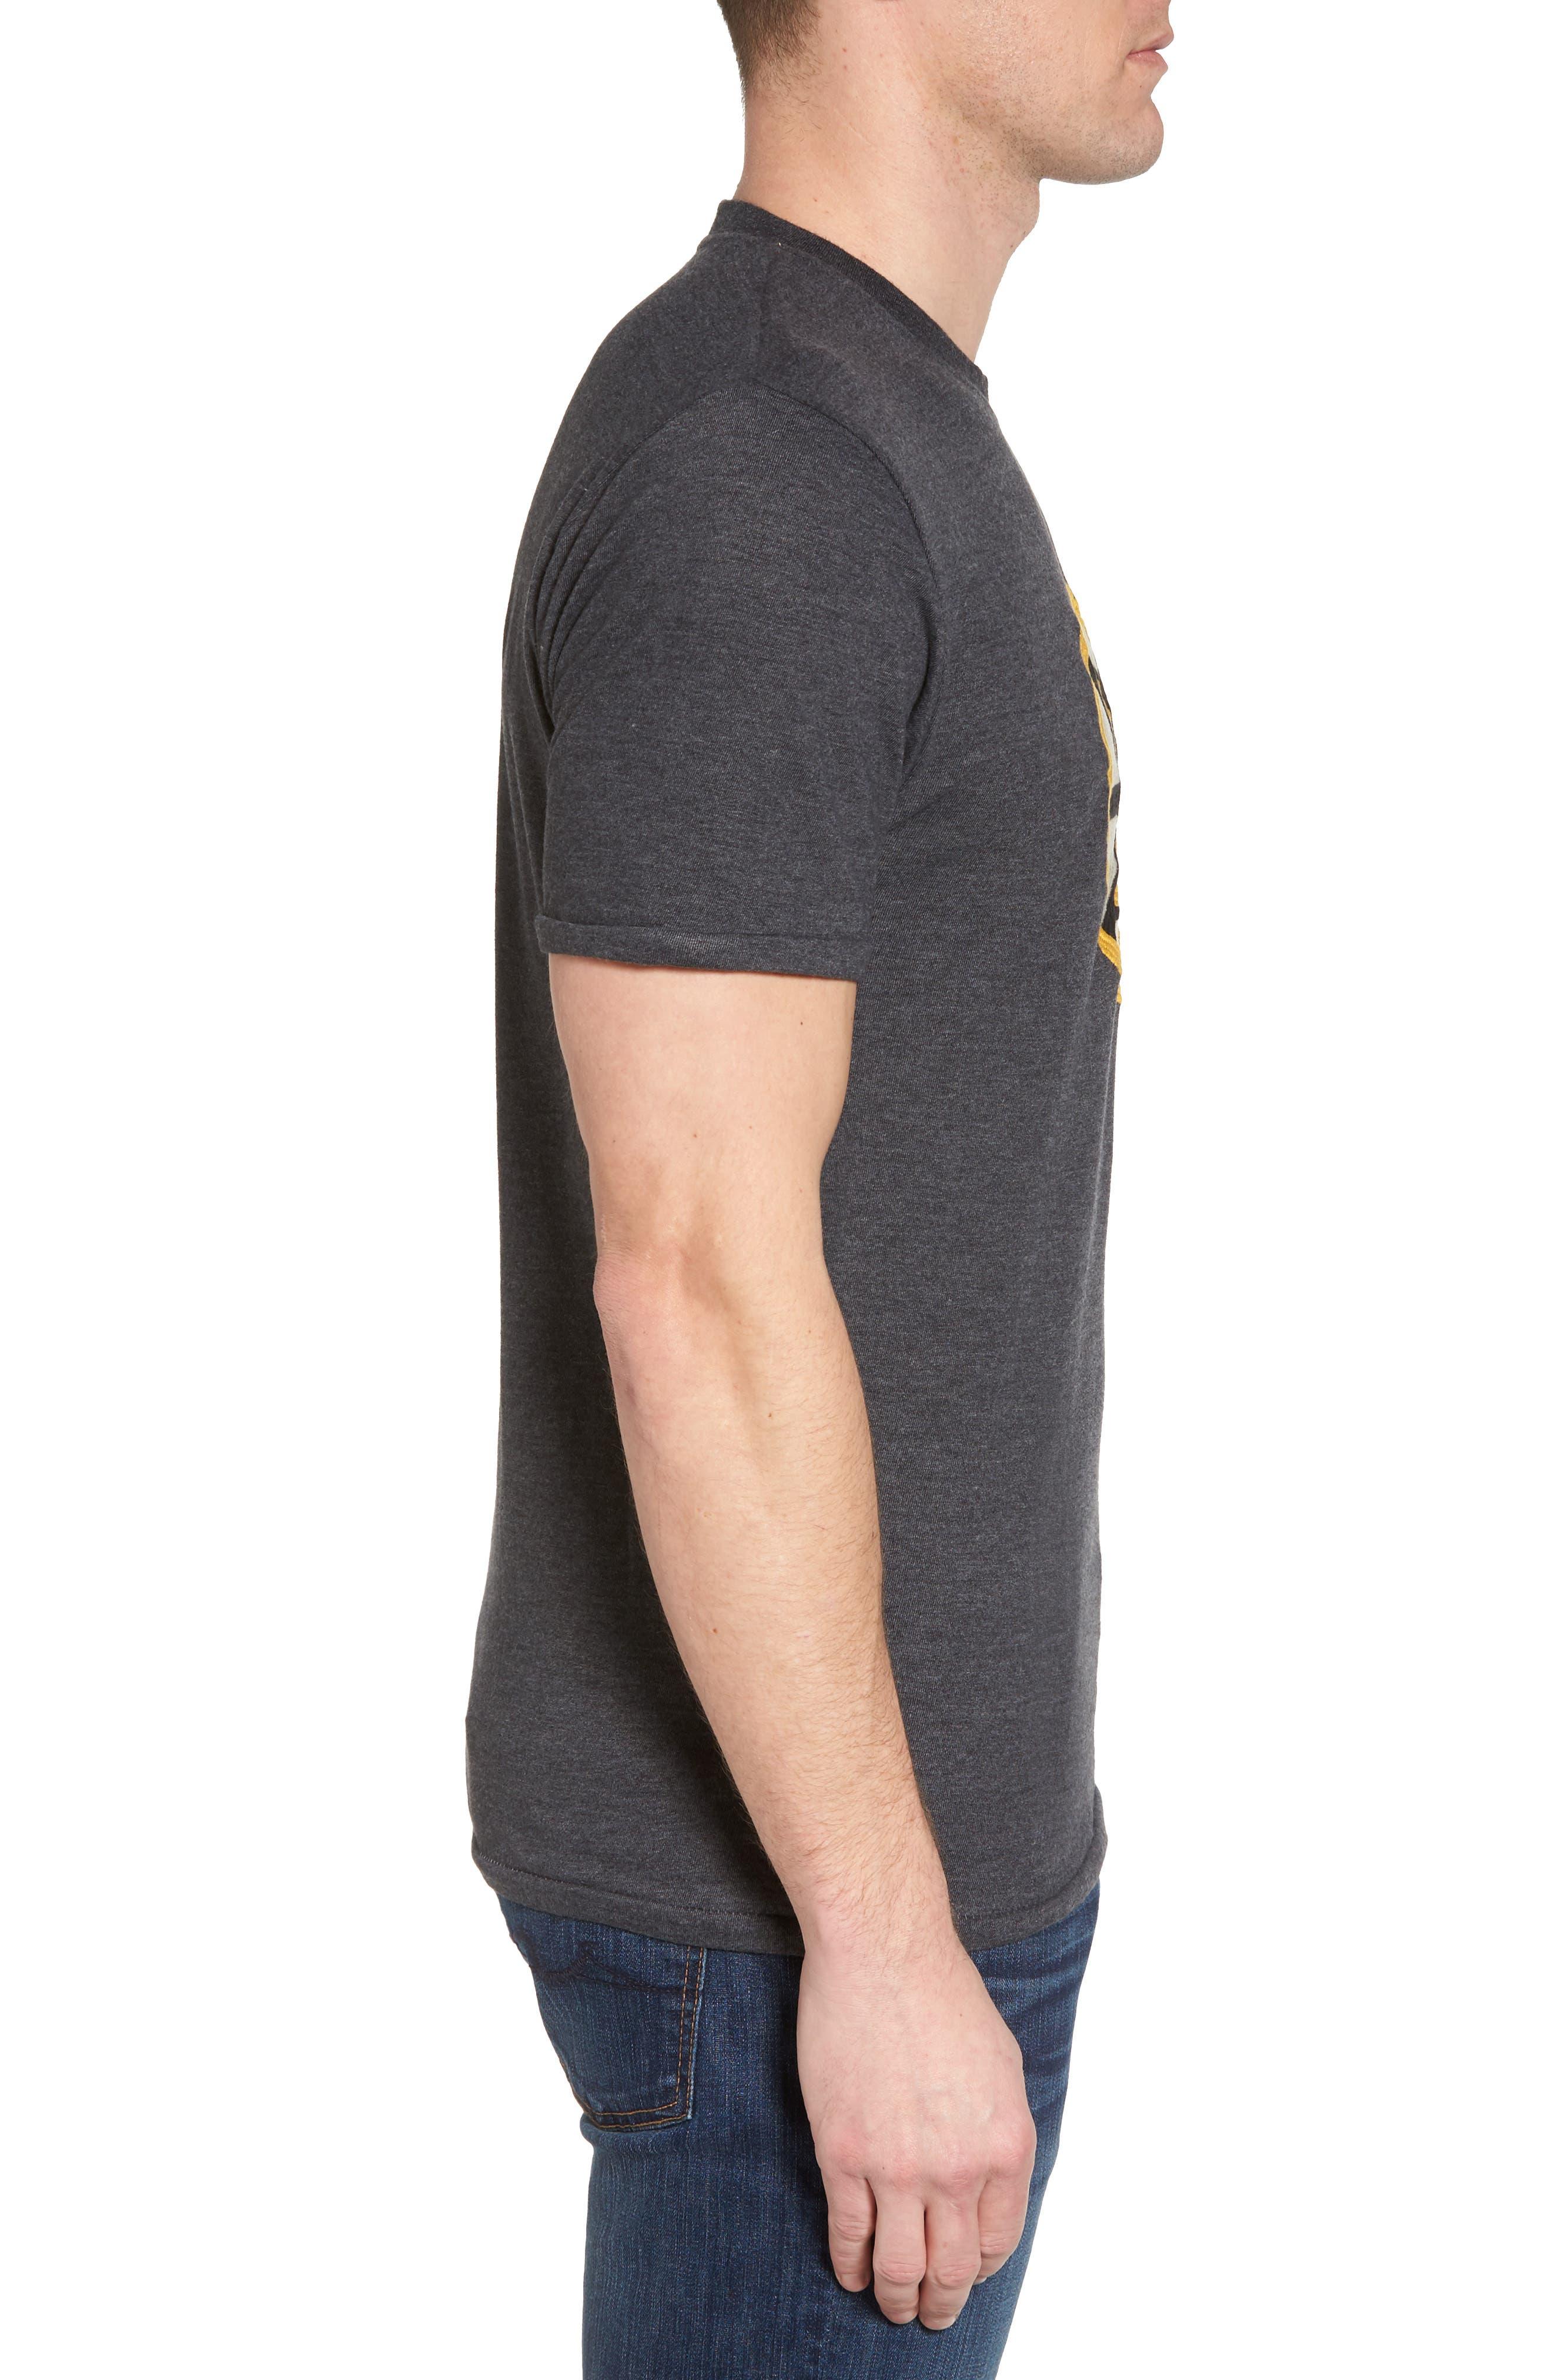 Hillwood Bruins T-Shirt,                             Alternate thumbnail 3, color,                             Heather Black